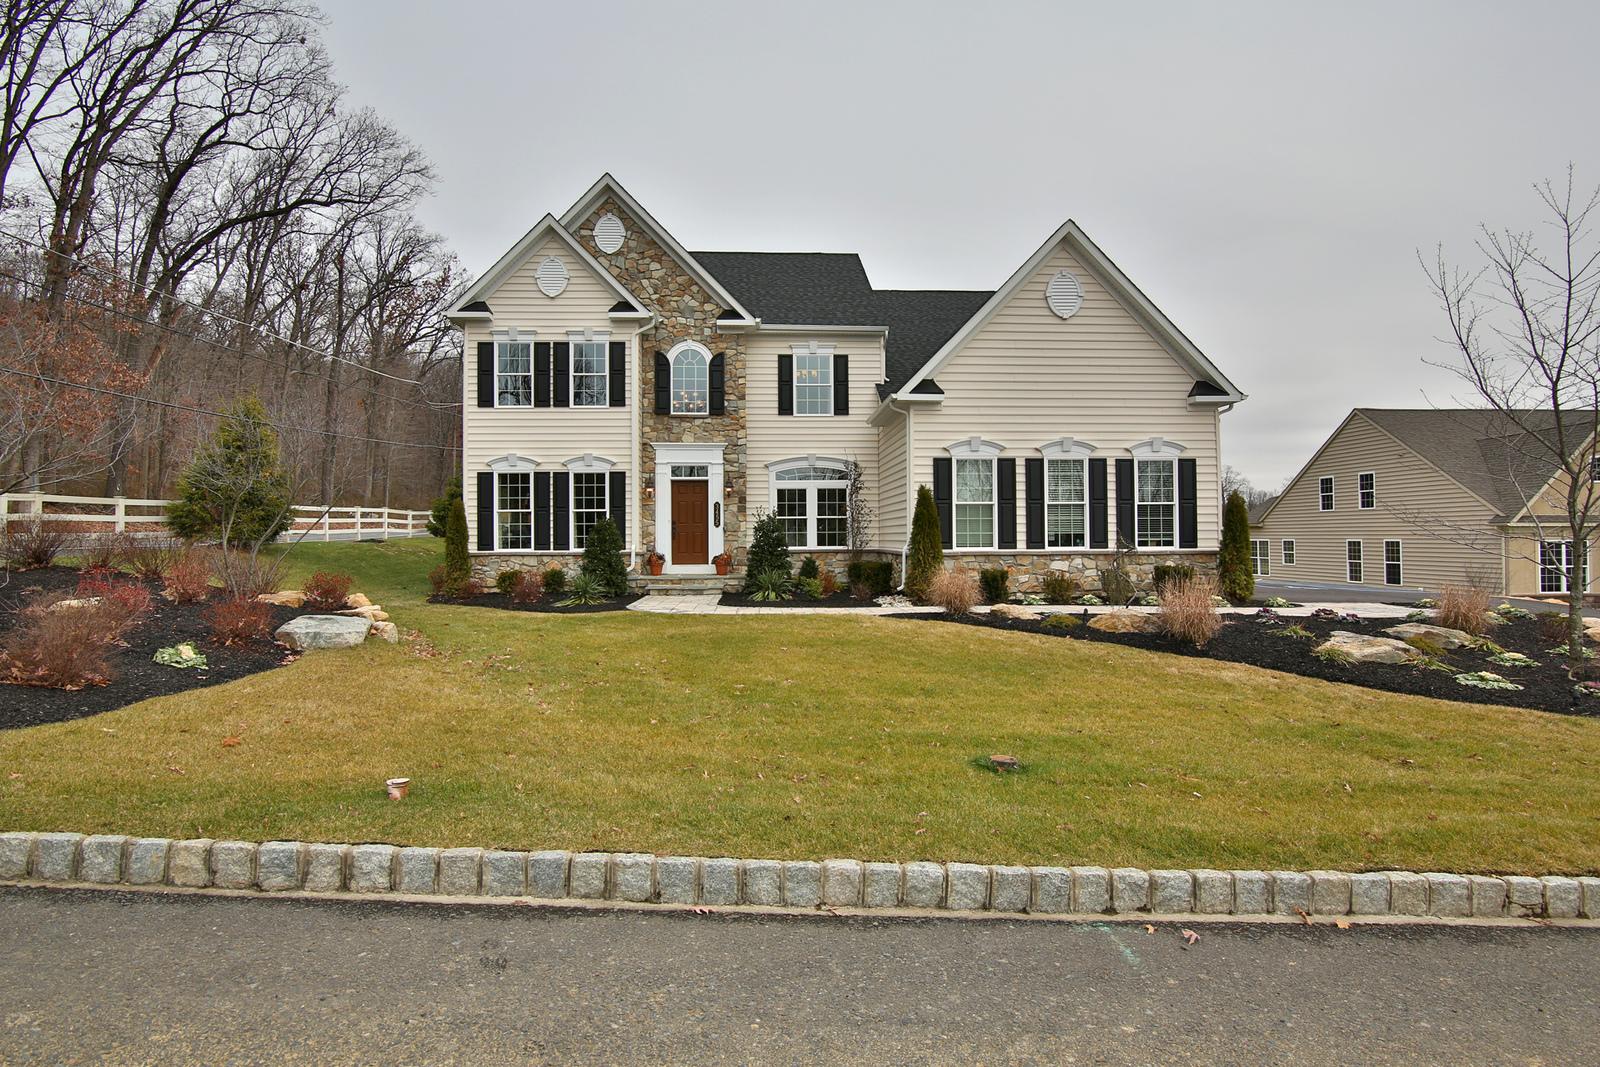 New Empress Home Model For Sale Nvhomes